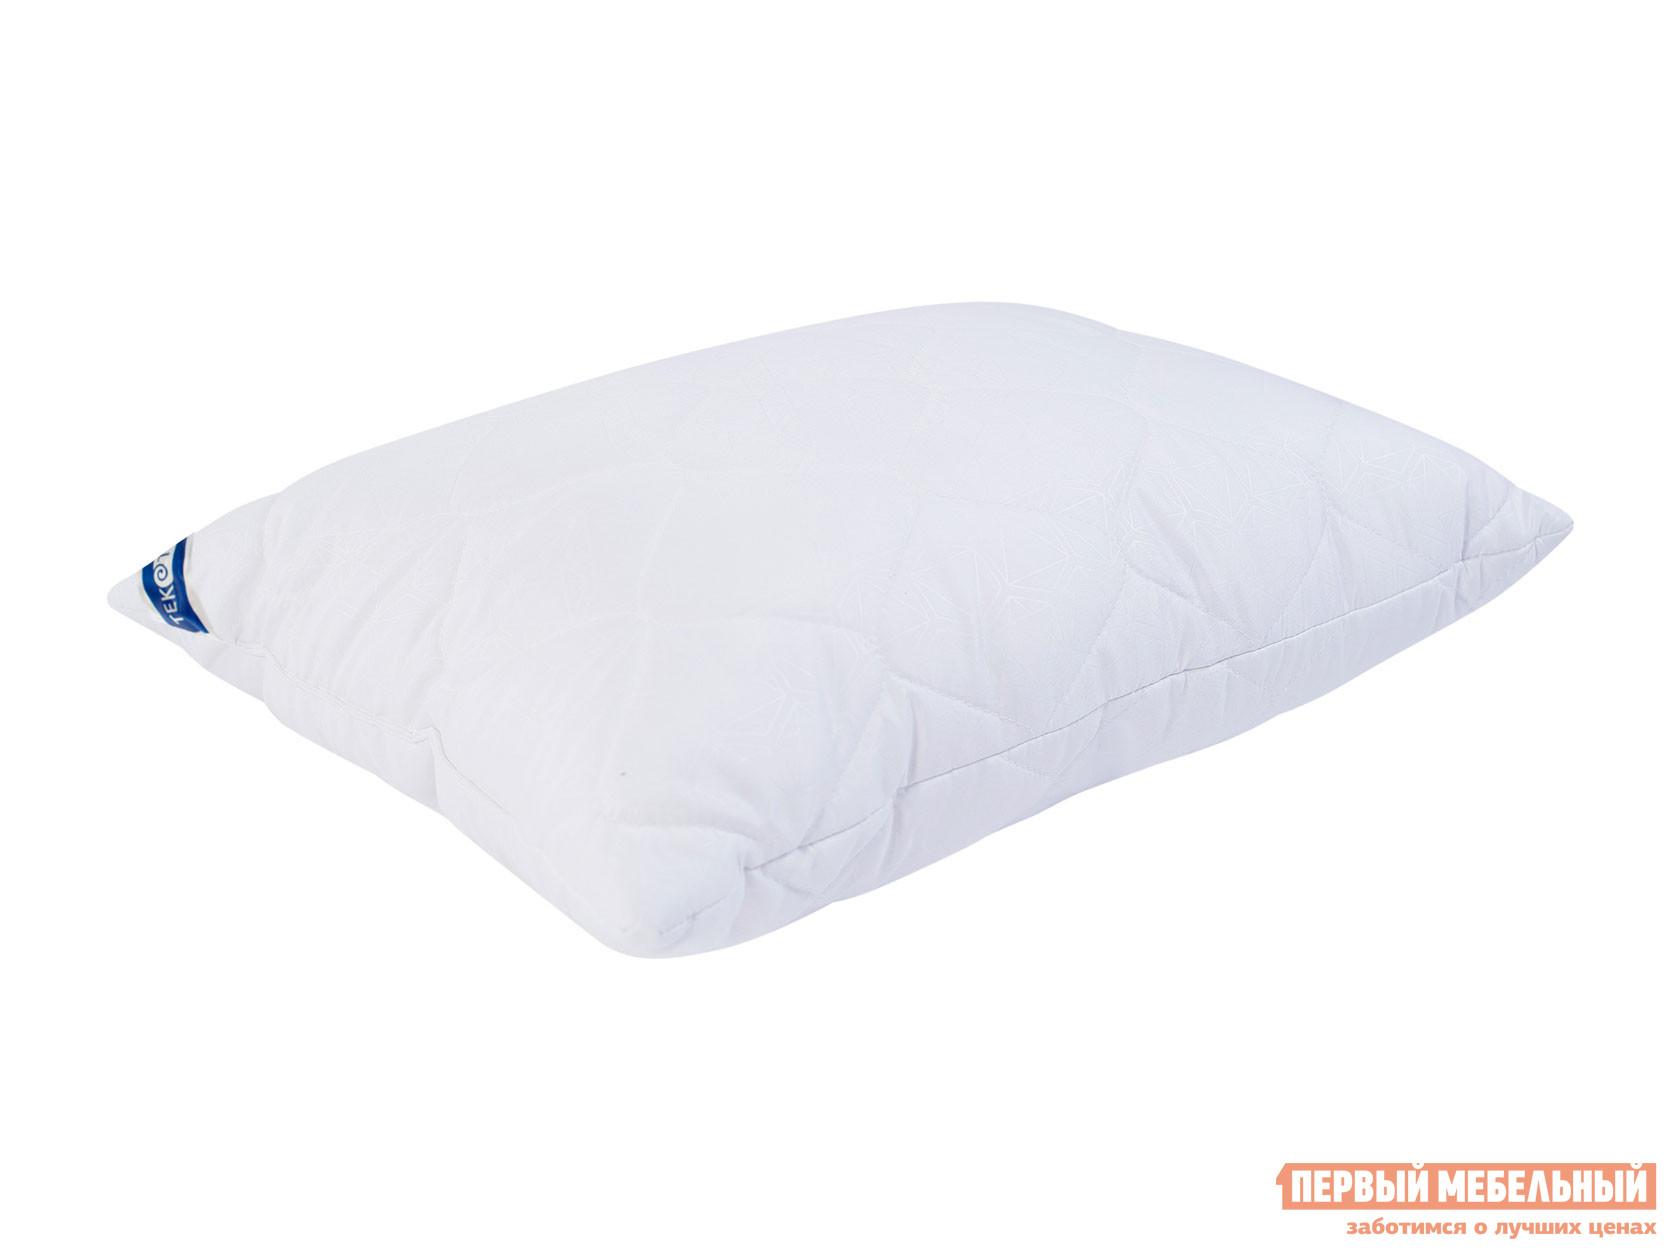 Подушка  Бамбук микрофибра Белый, 500 Х 700 мм Текстиль Про 114973